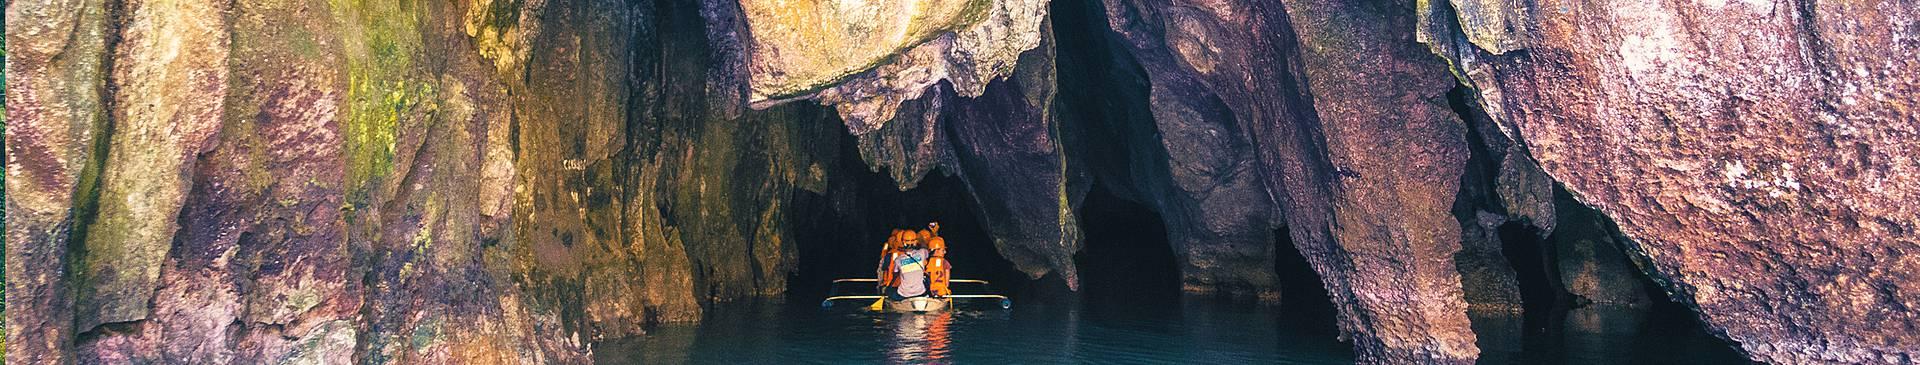 Adventure travel in the Philippines